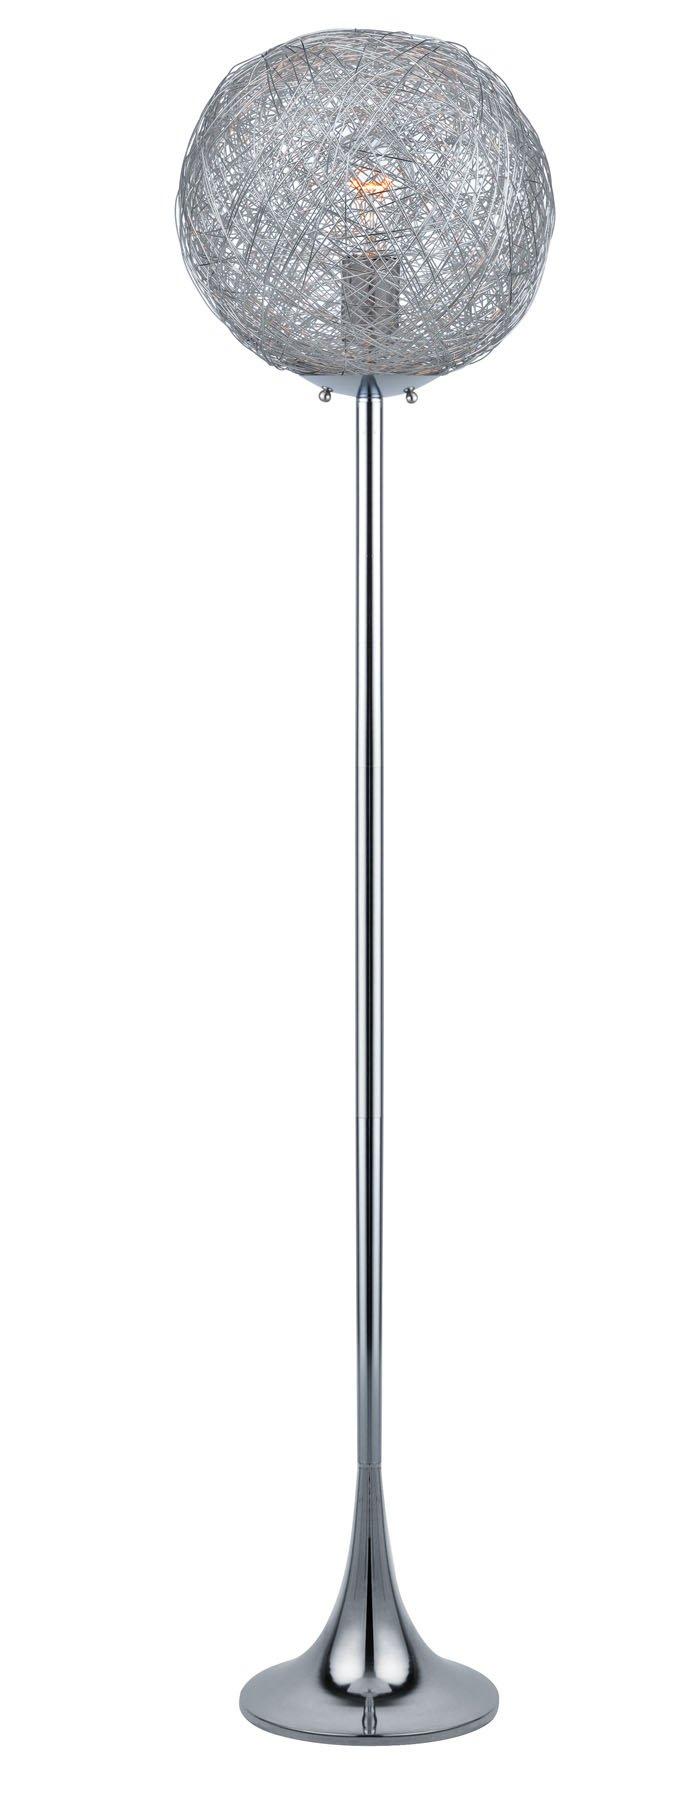 Lite Source Floor Lamps Ls-82374 Kolina Floor Lamp, Chrome, Aluminum Shade